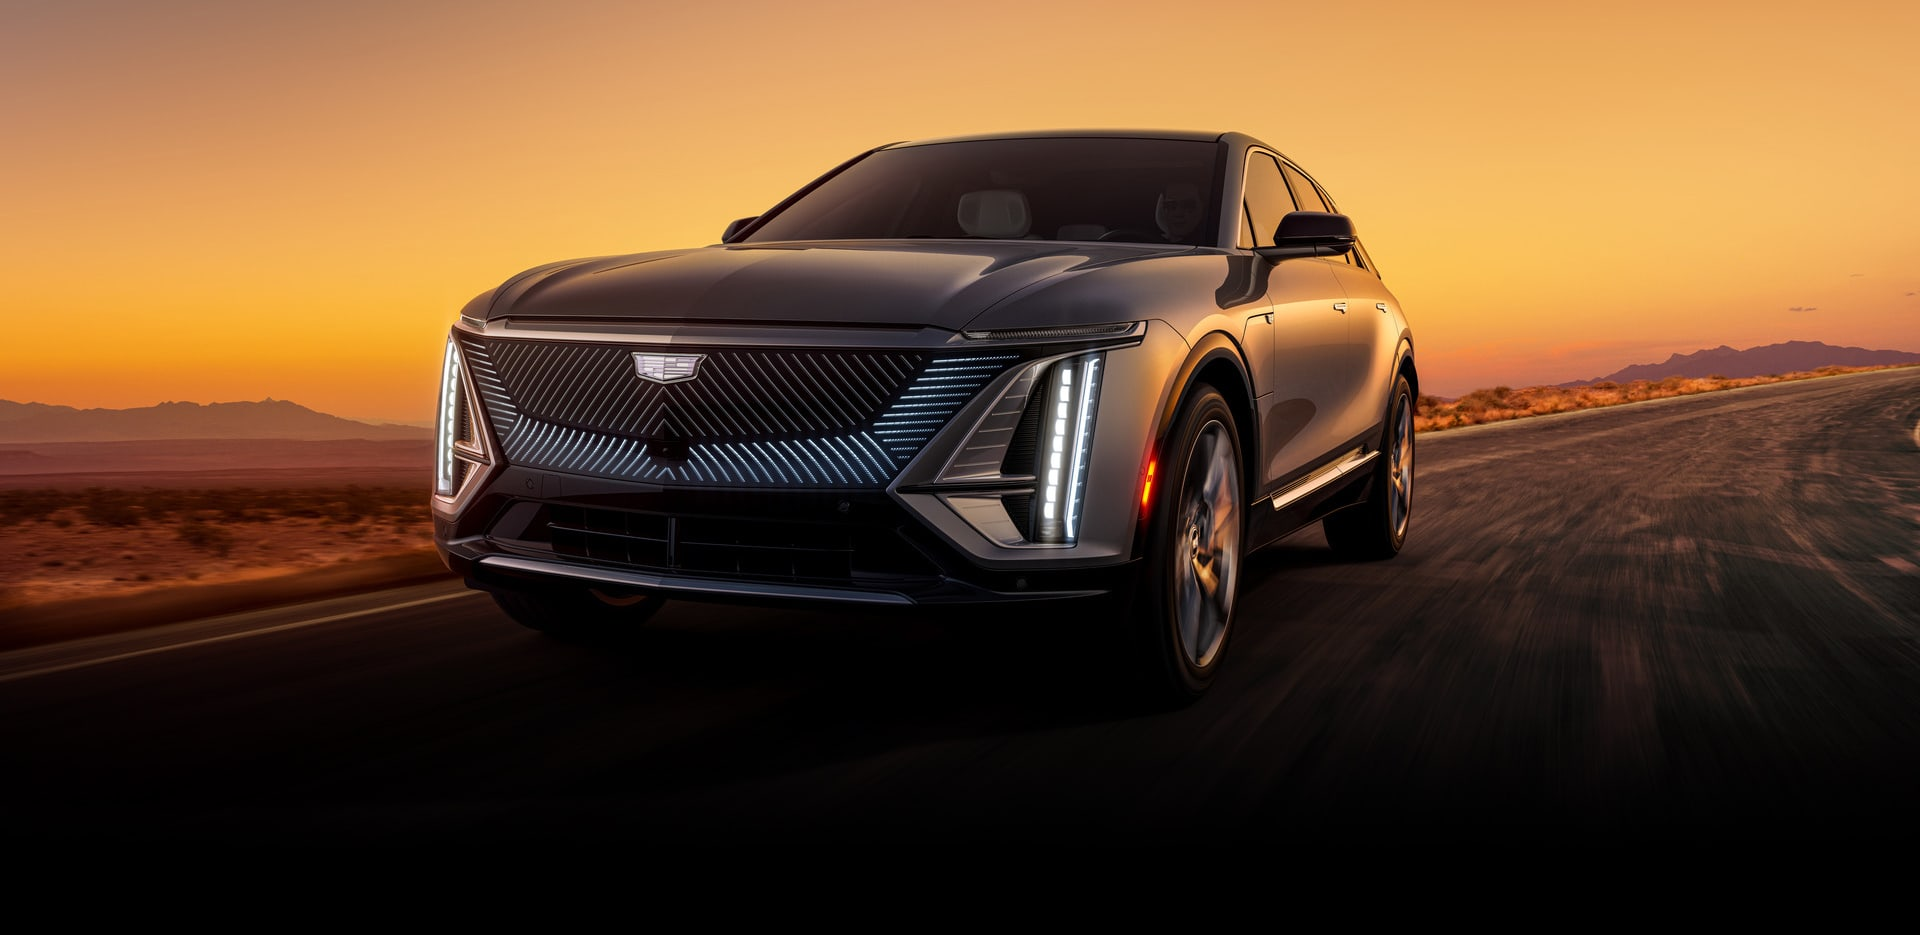 2023 Cadillac Lyriq driving at sunset